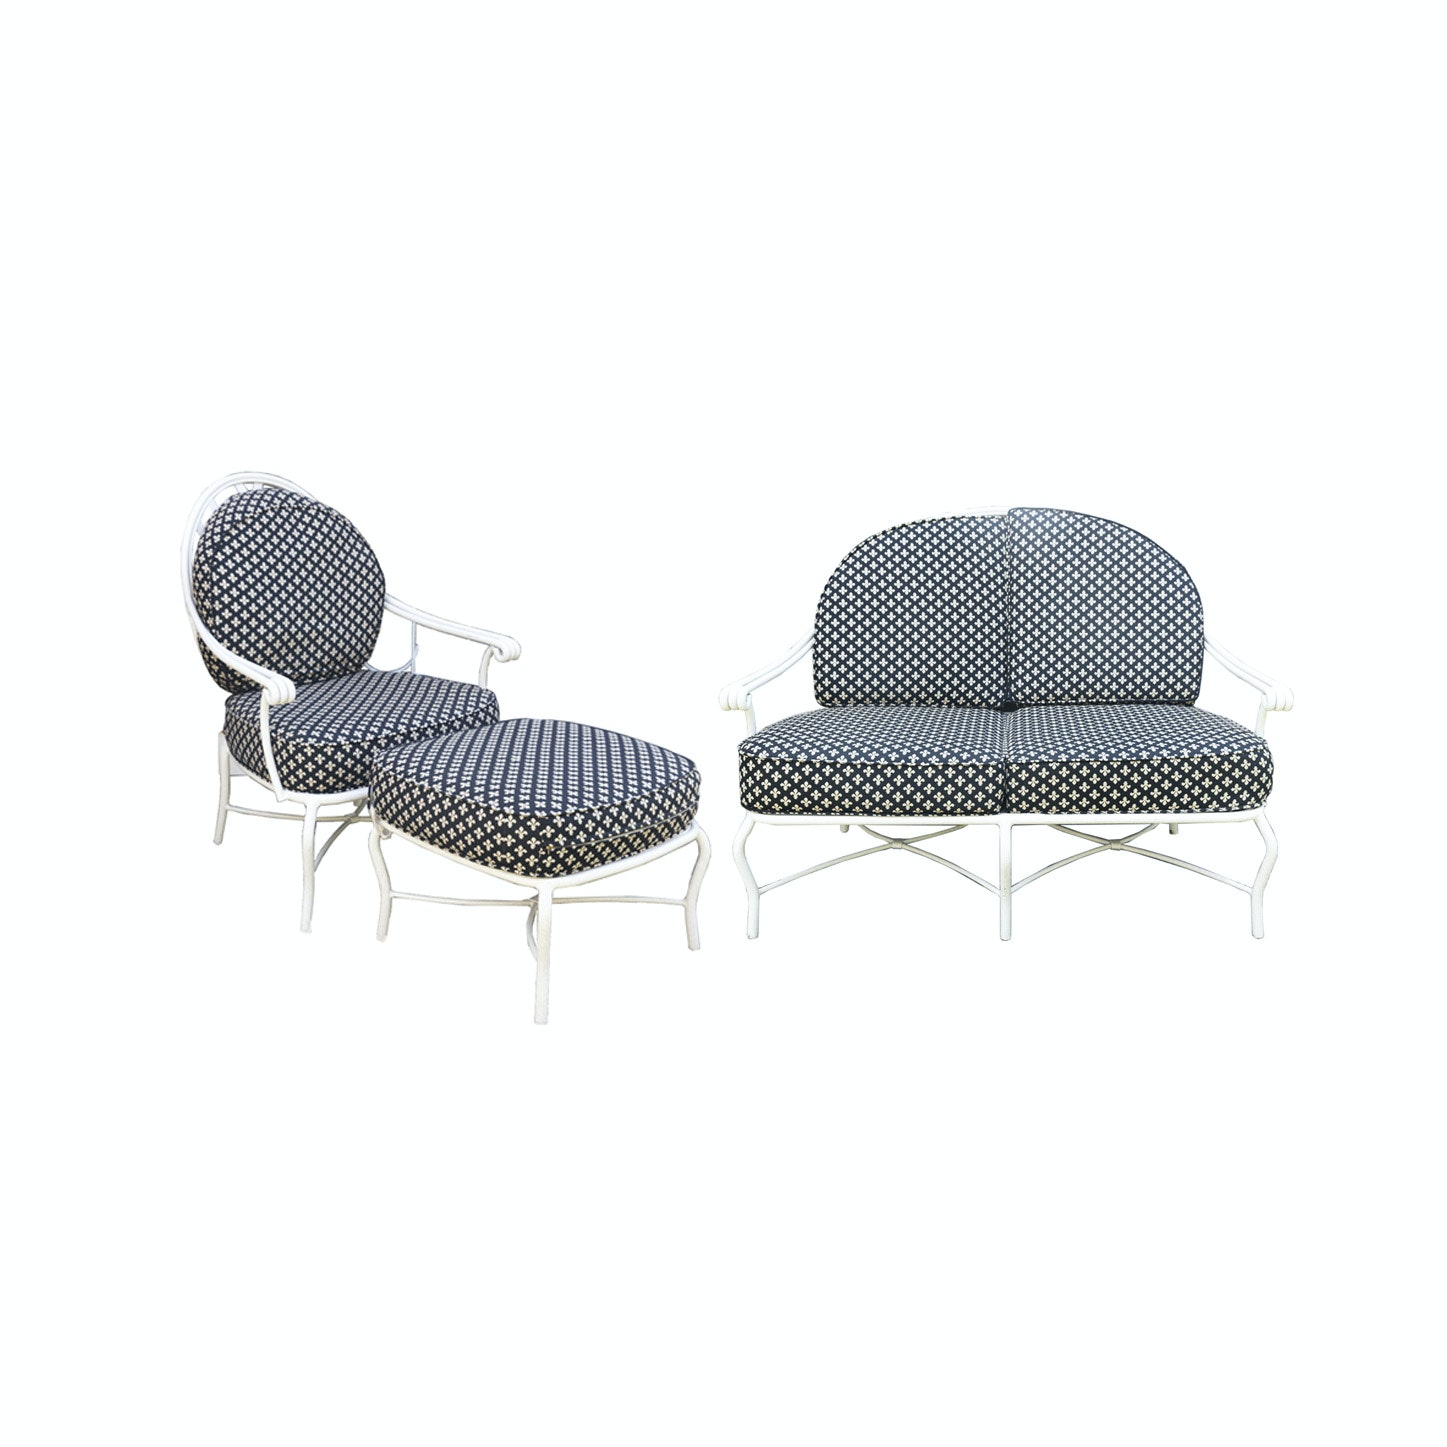 Metal Patio Furniture Set